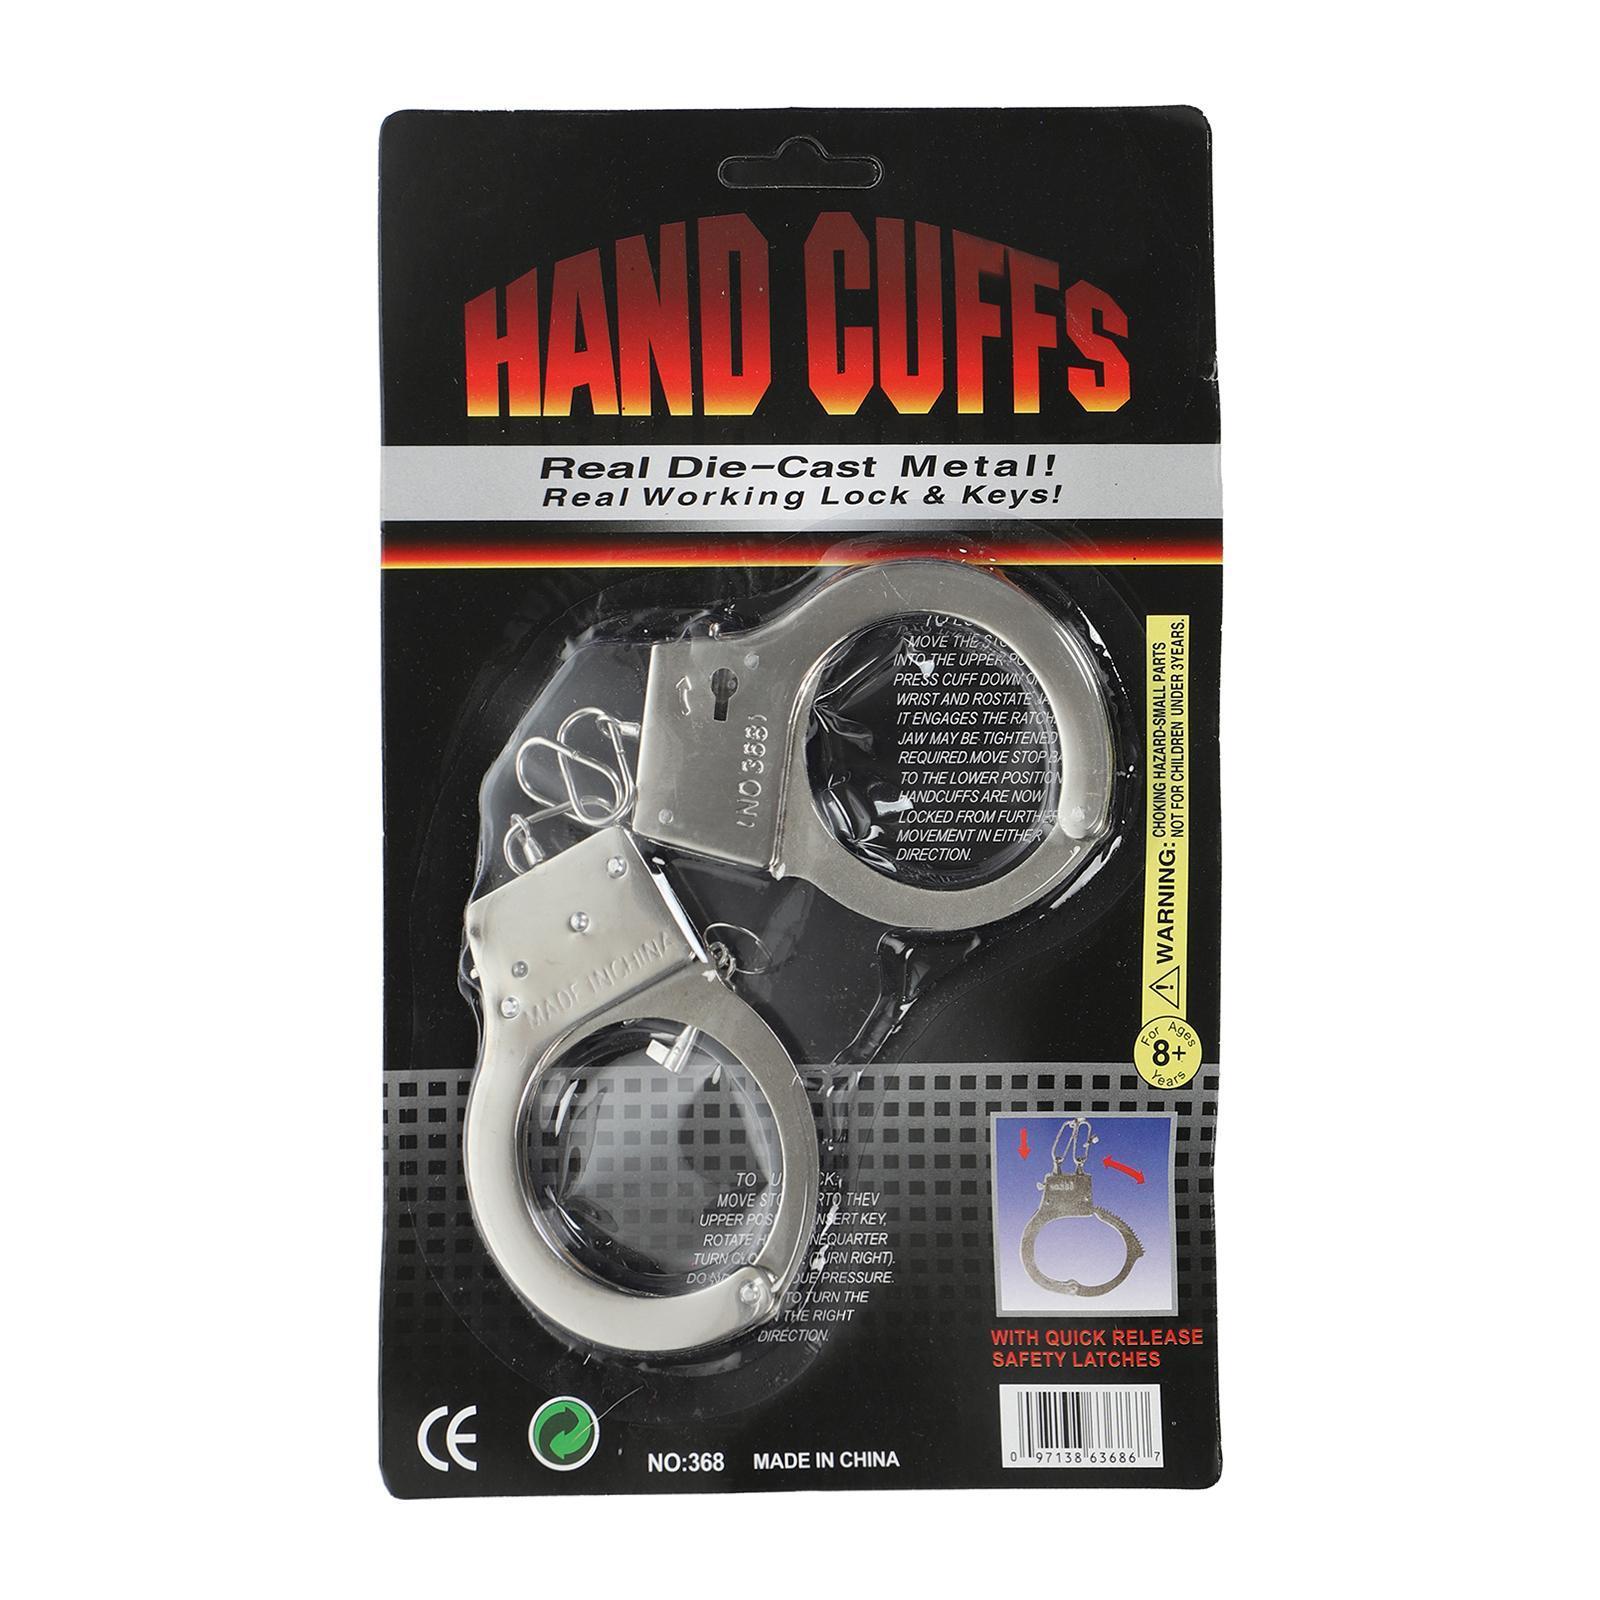 CGS Metal Hand Cuffs 368